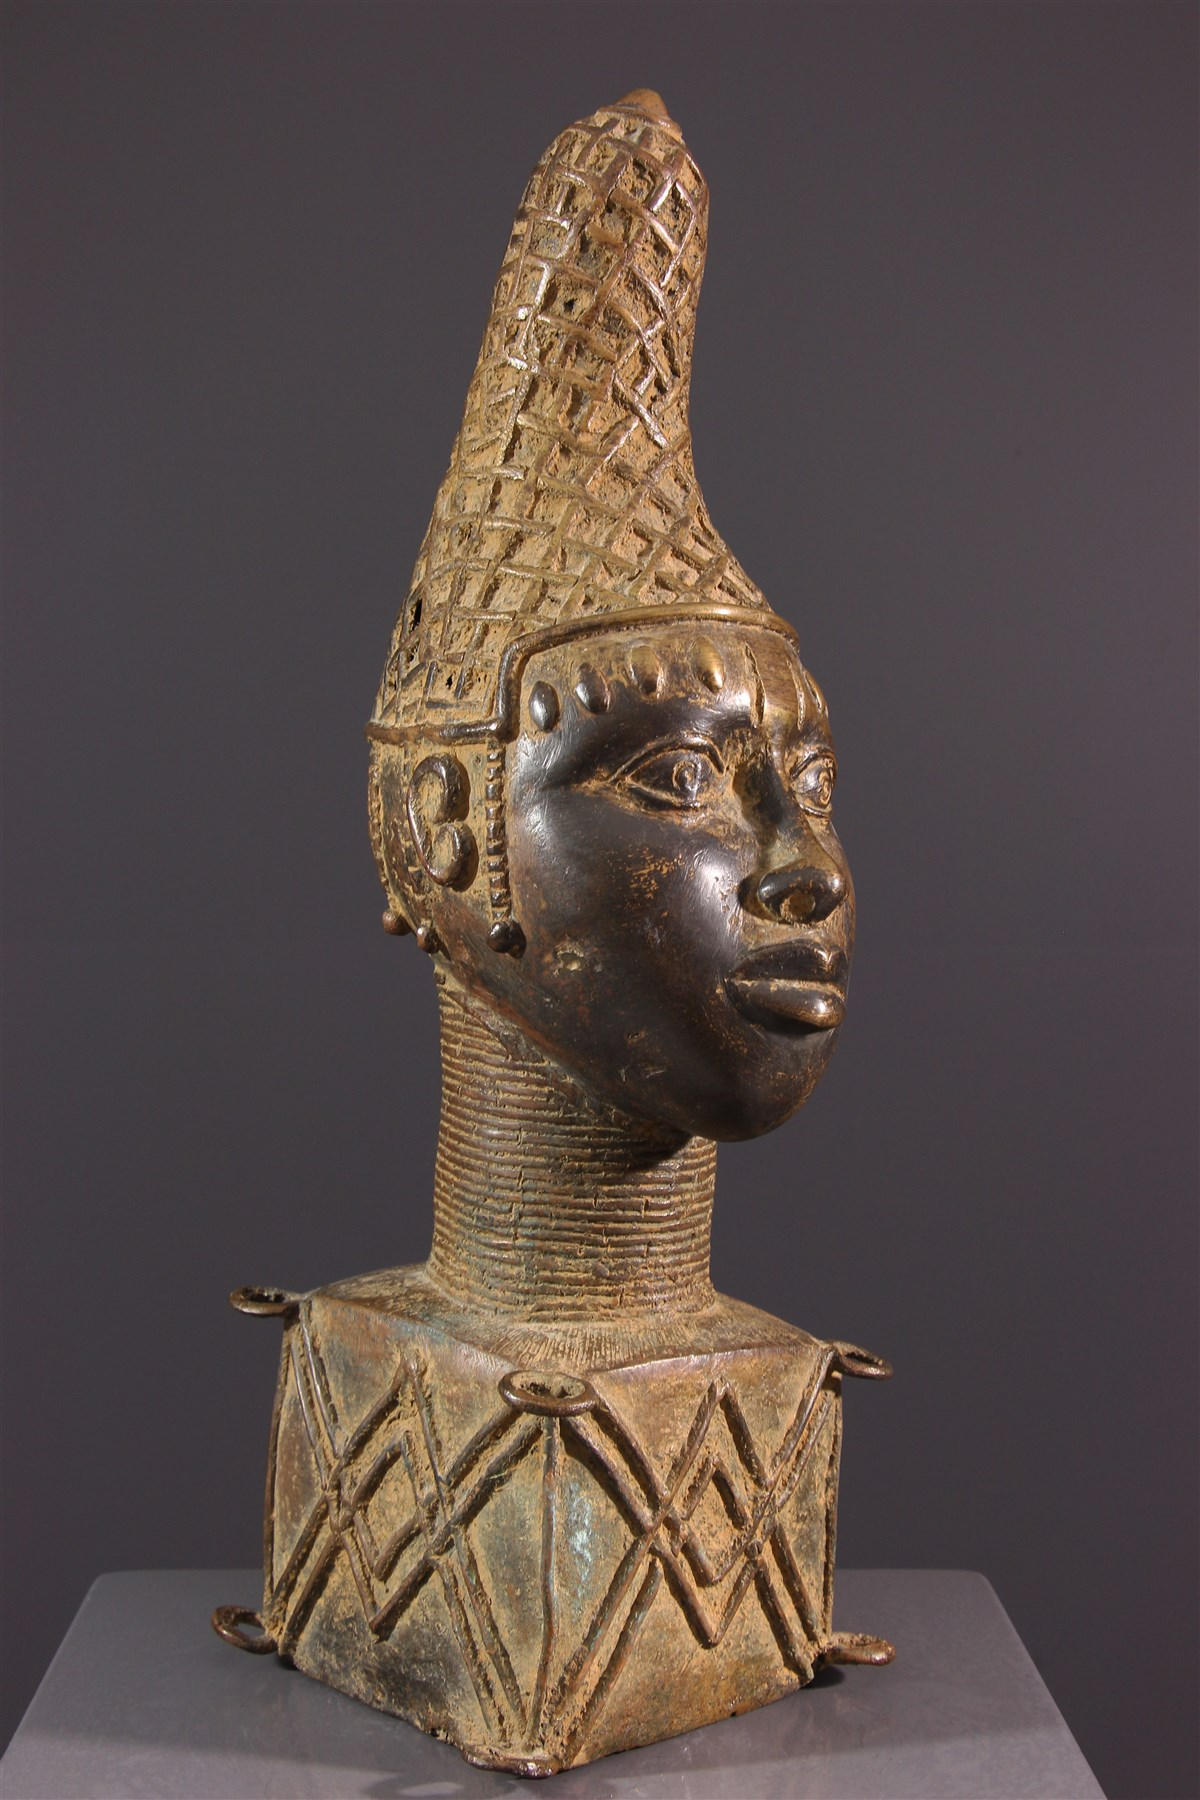 Tête commémorative reine  Bénin - Art africain